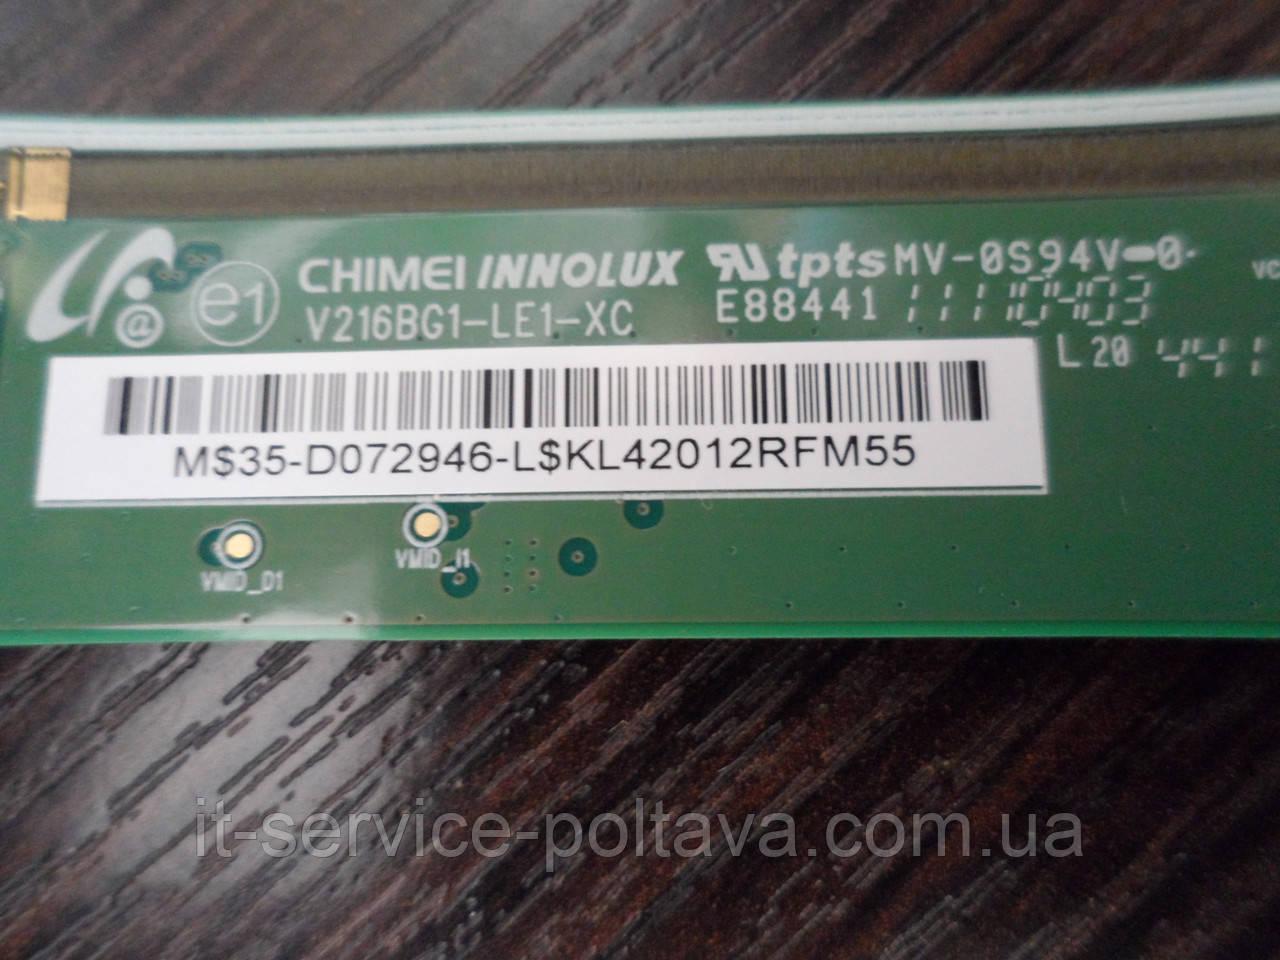 Тайминг-Контроллер (T-CON) V216BG1-LE1-XC THOMSON 22HS4246C